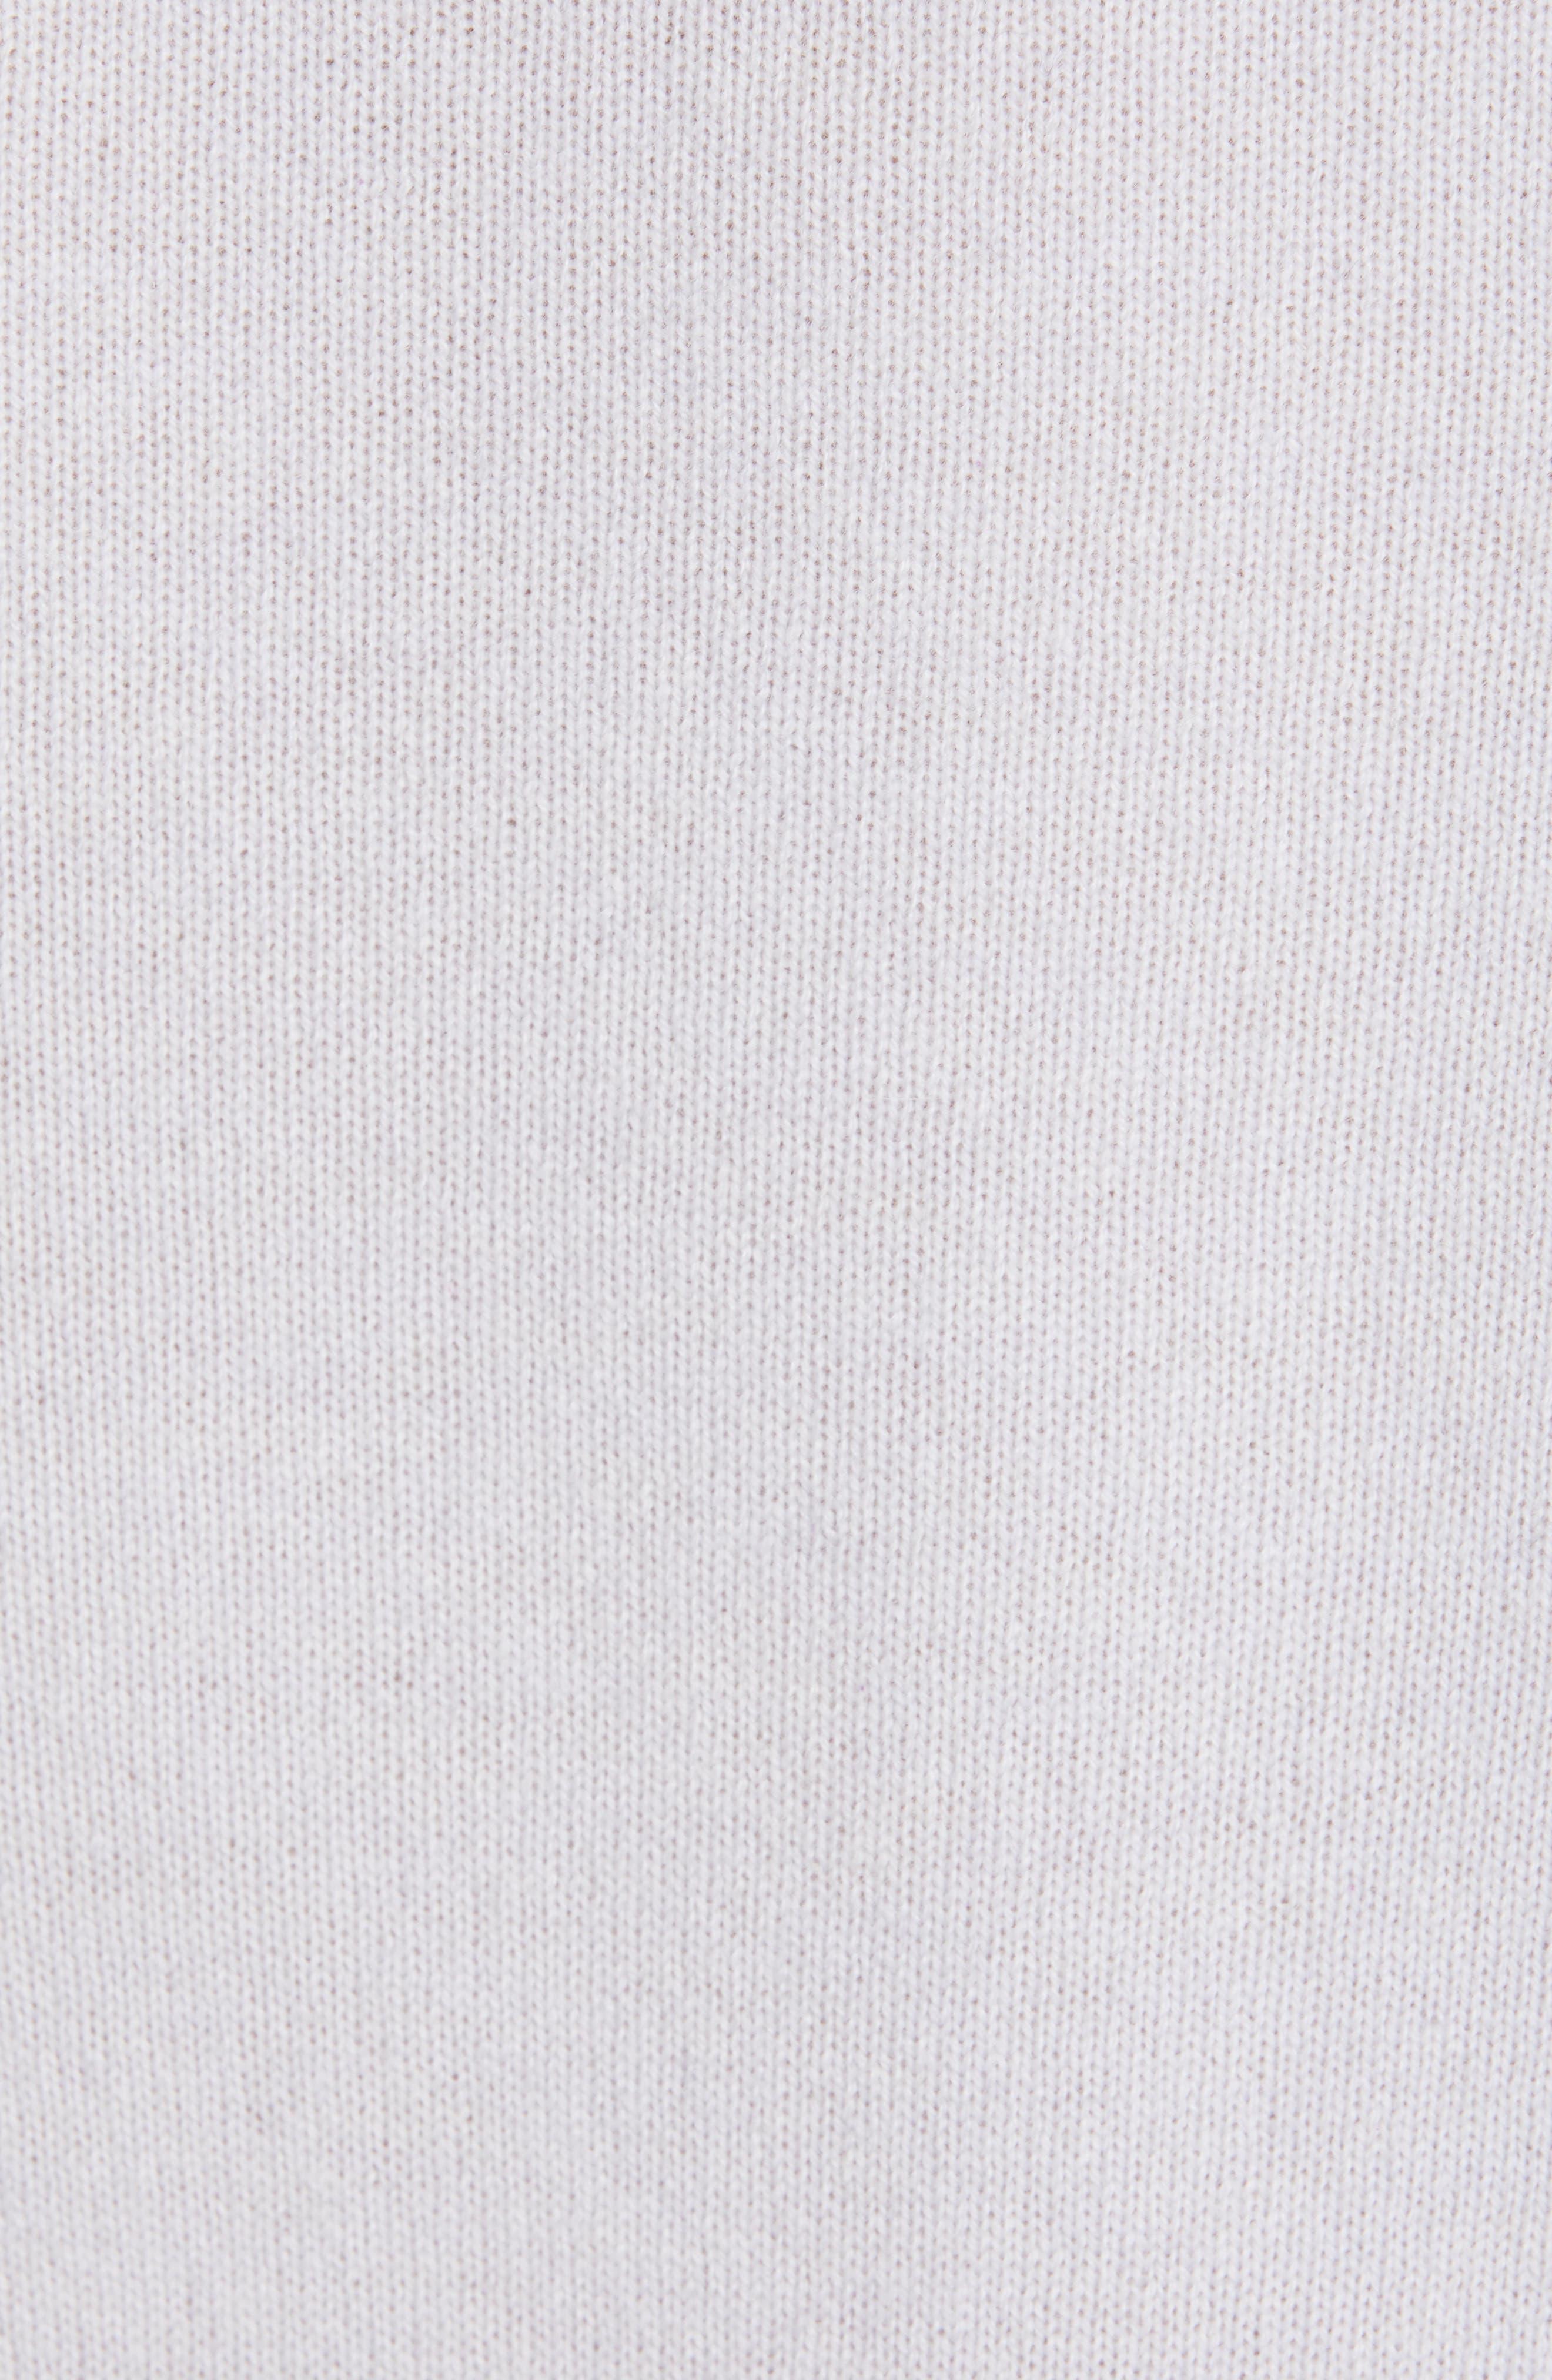 PROENZA SCHOULER, Cashmere Sweater, Alternate thumbnail 5, color, BLUE GREY